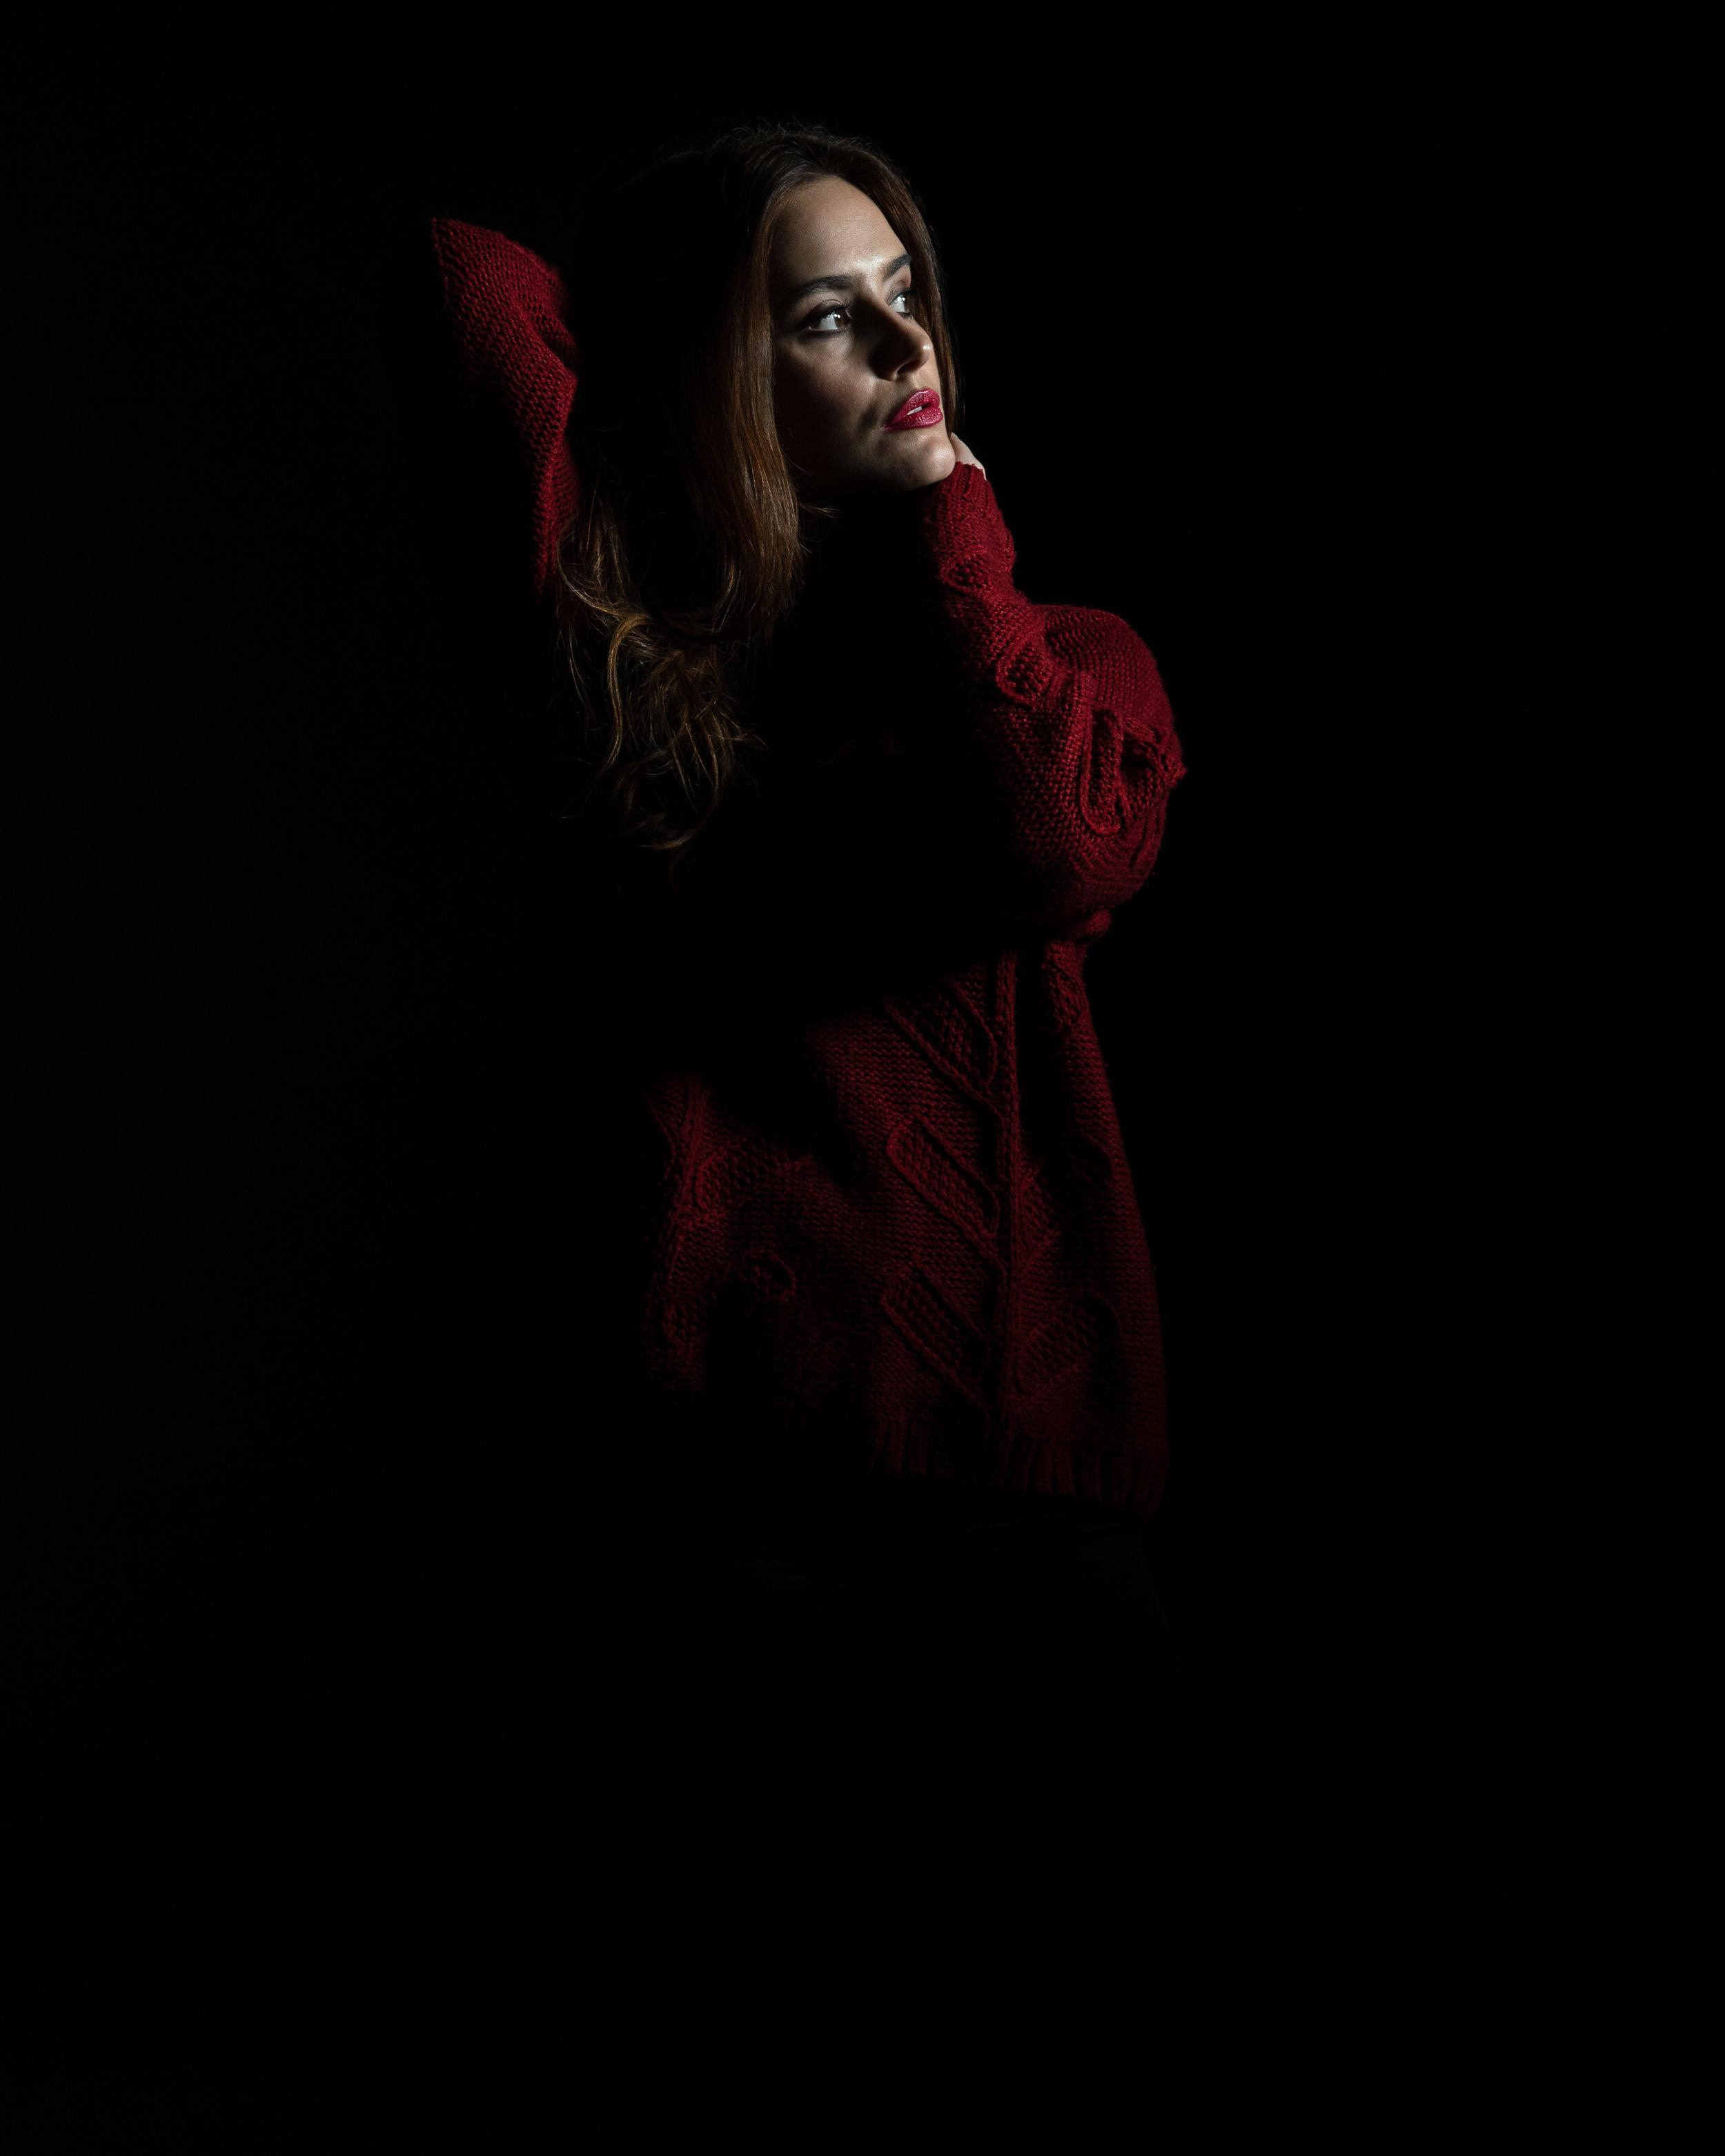 EmilyAnderson-18Nov2018-150-Edit.jpg